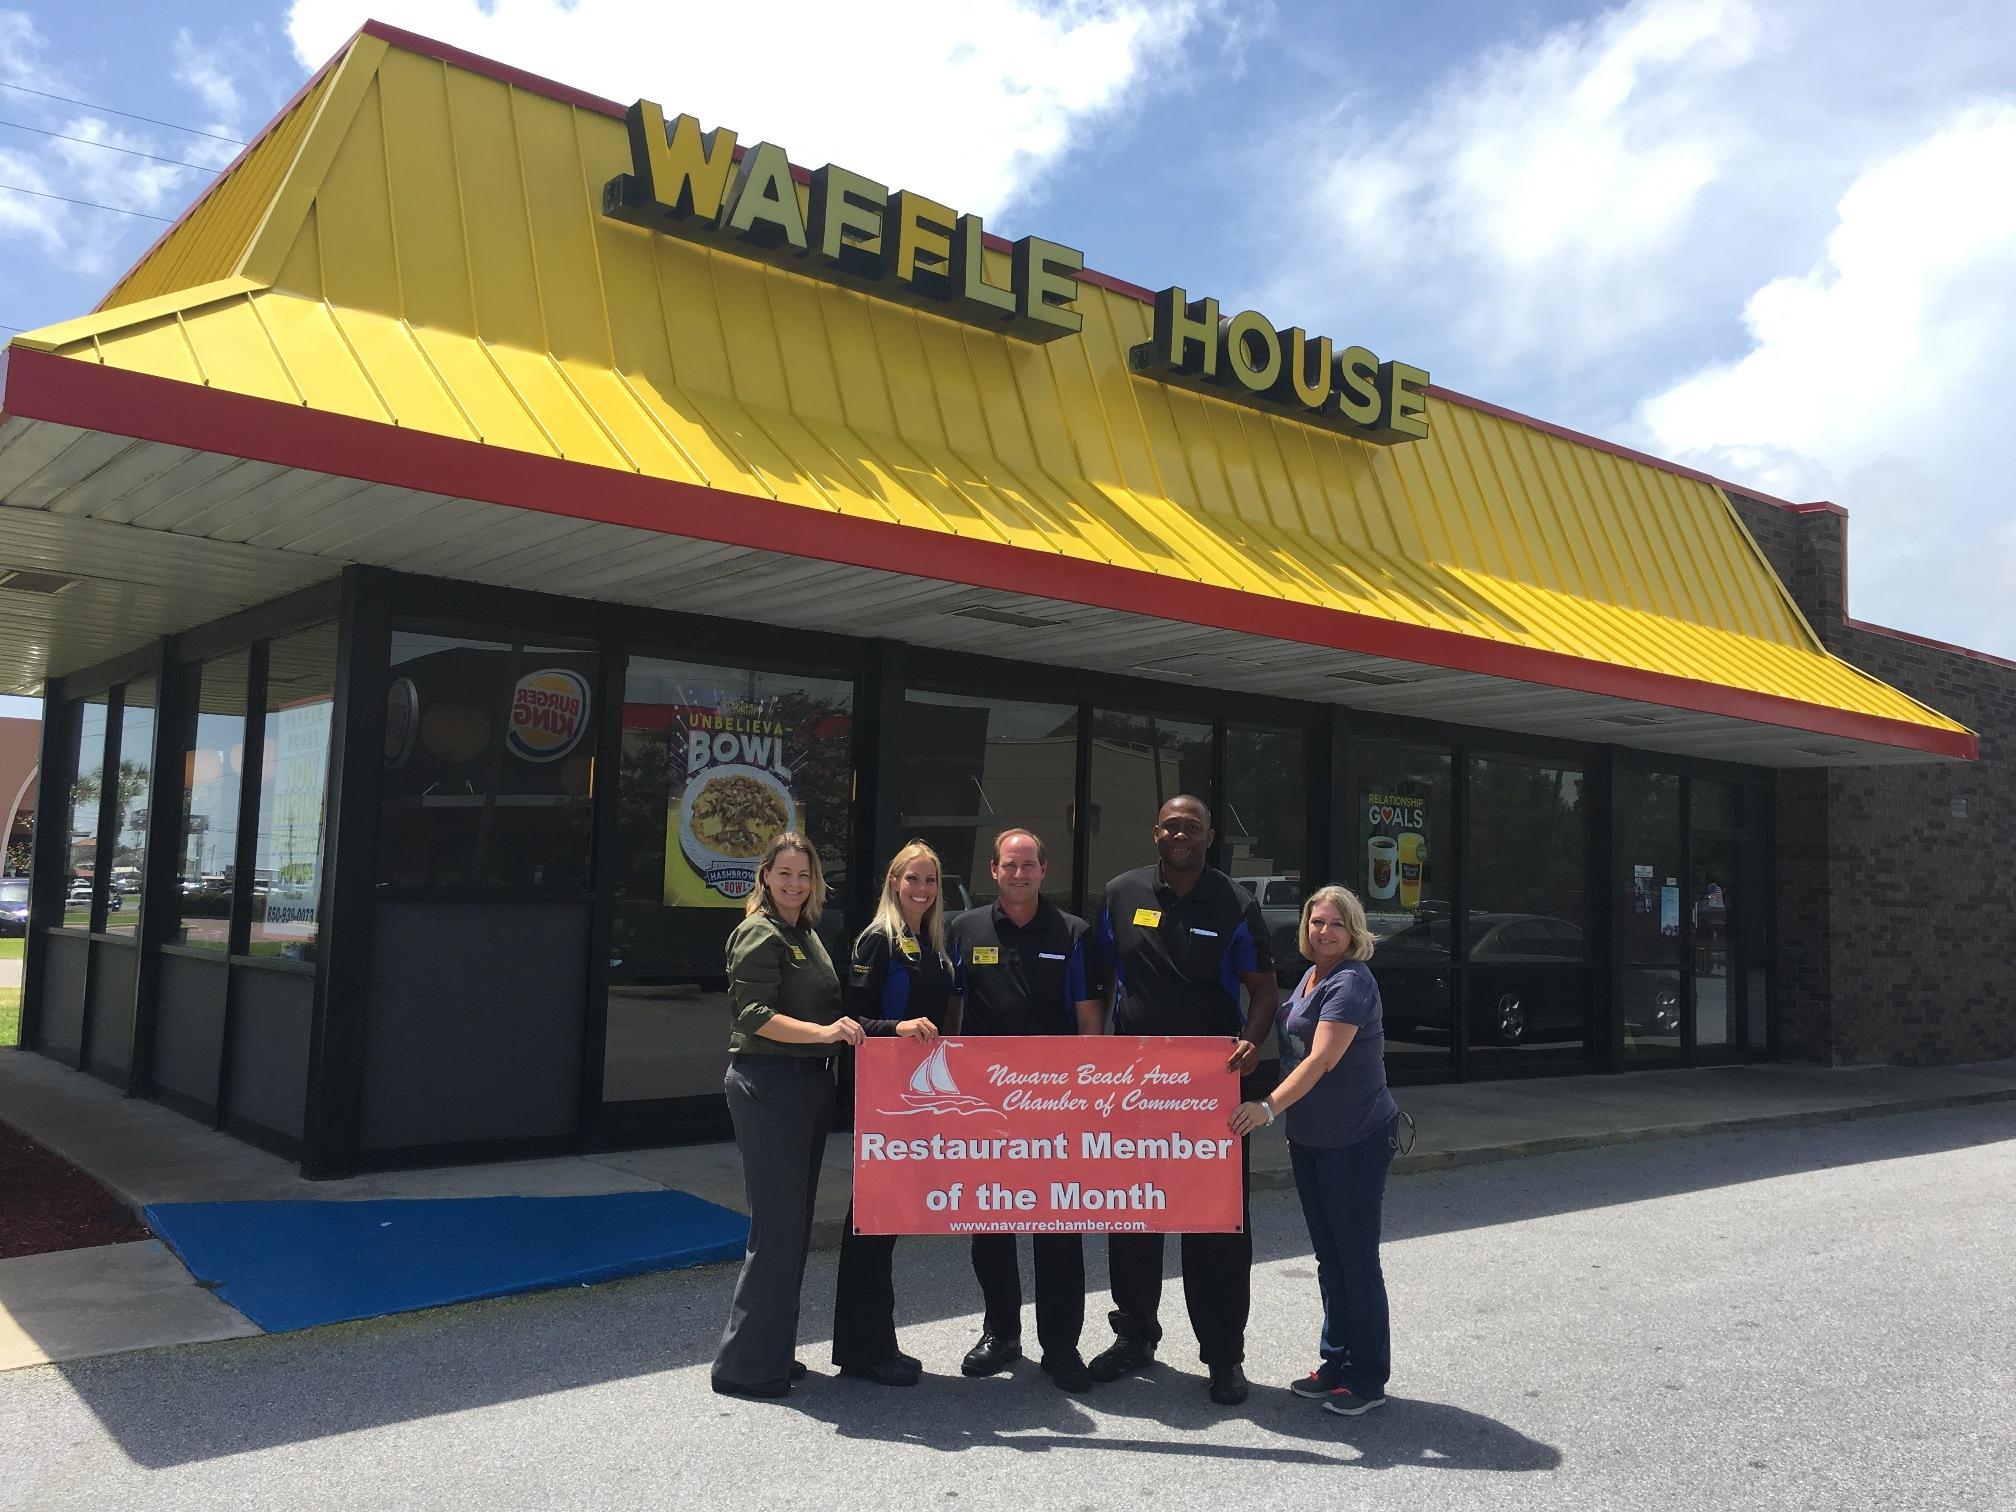 Waffle House Restaurant degreesdesign